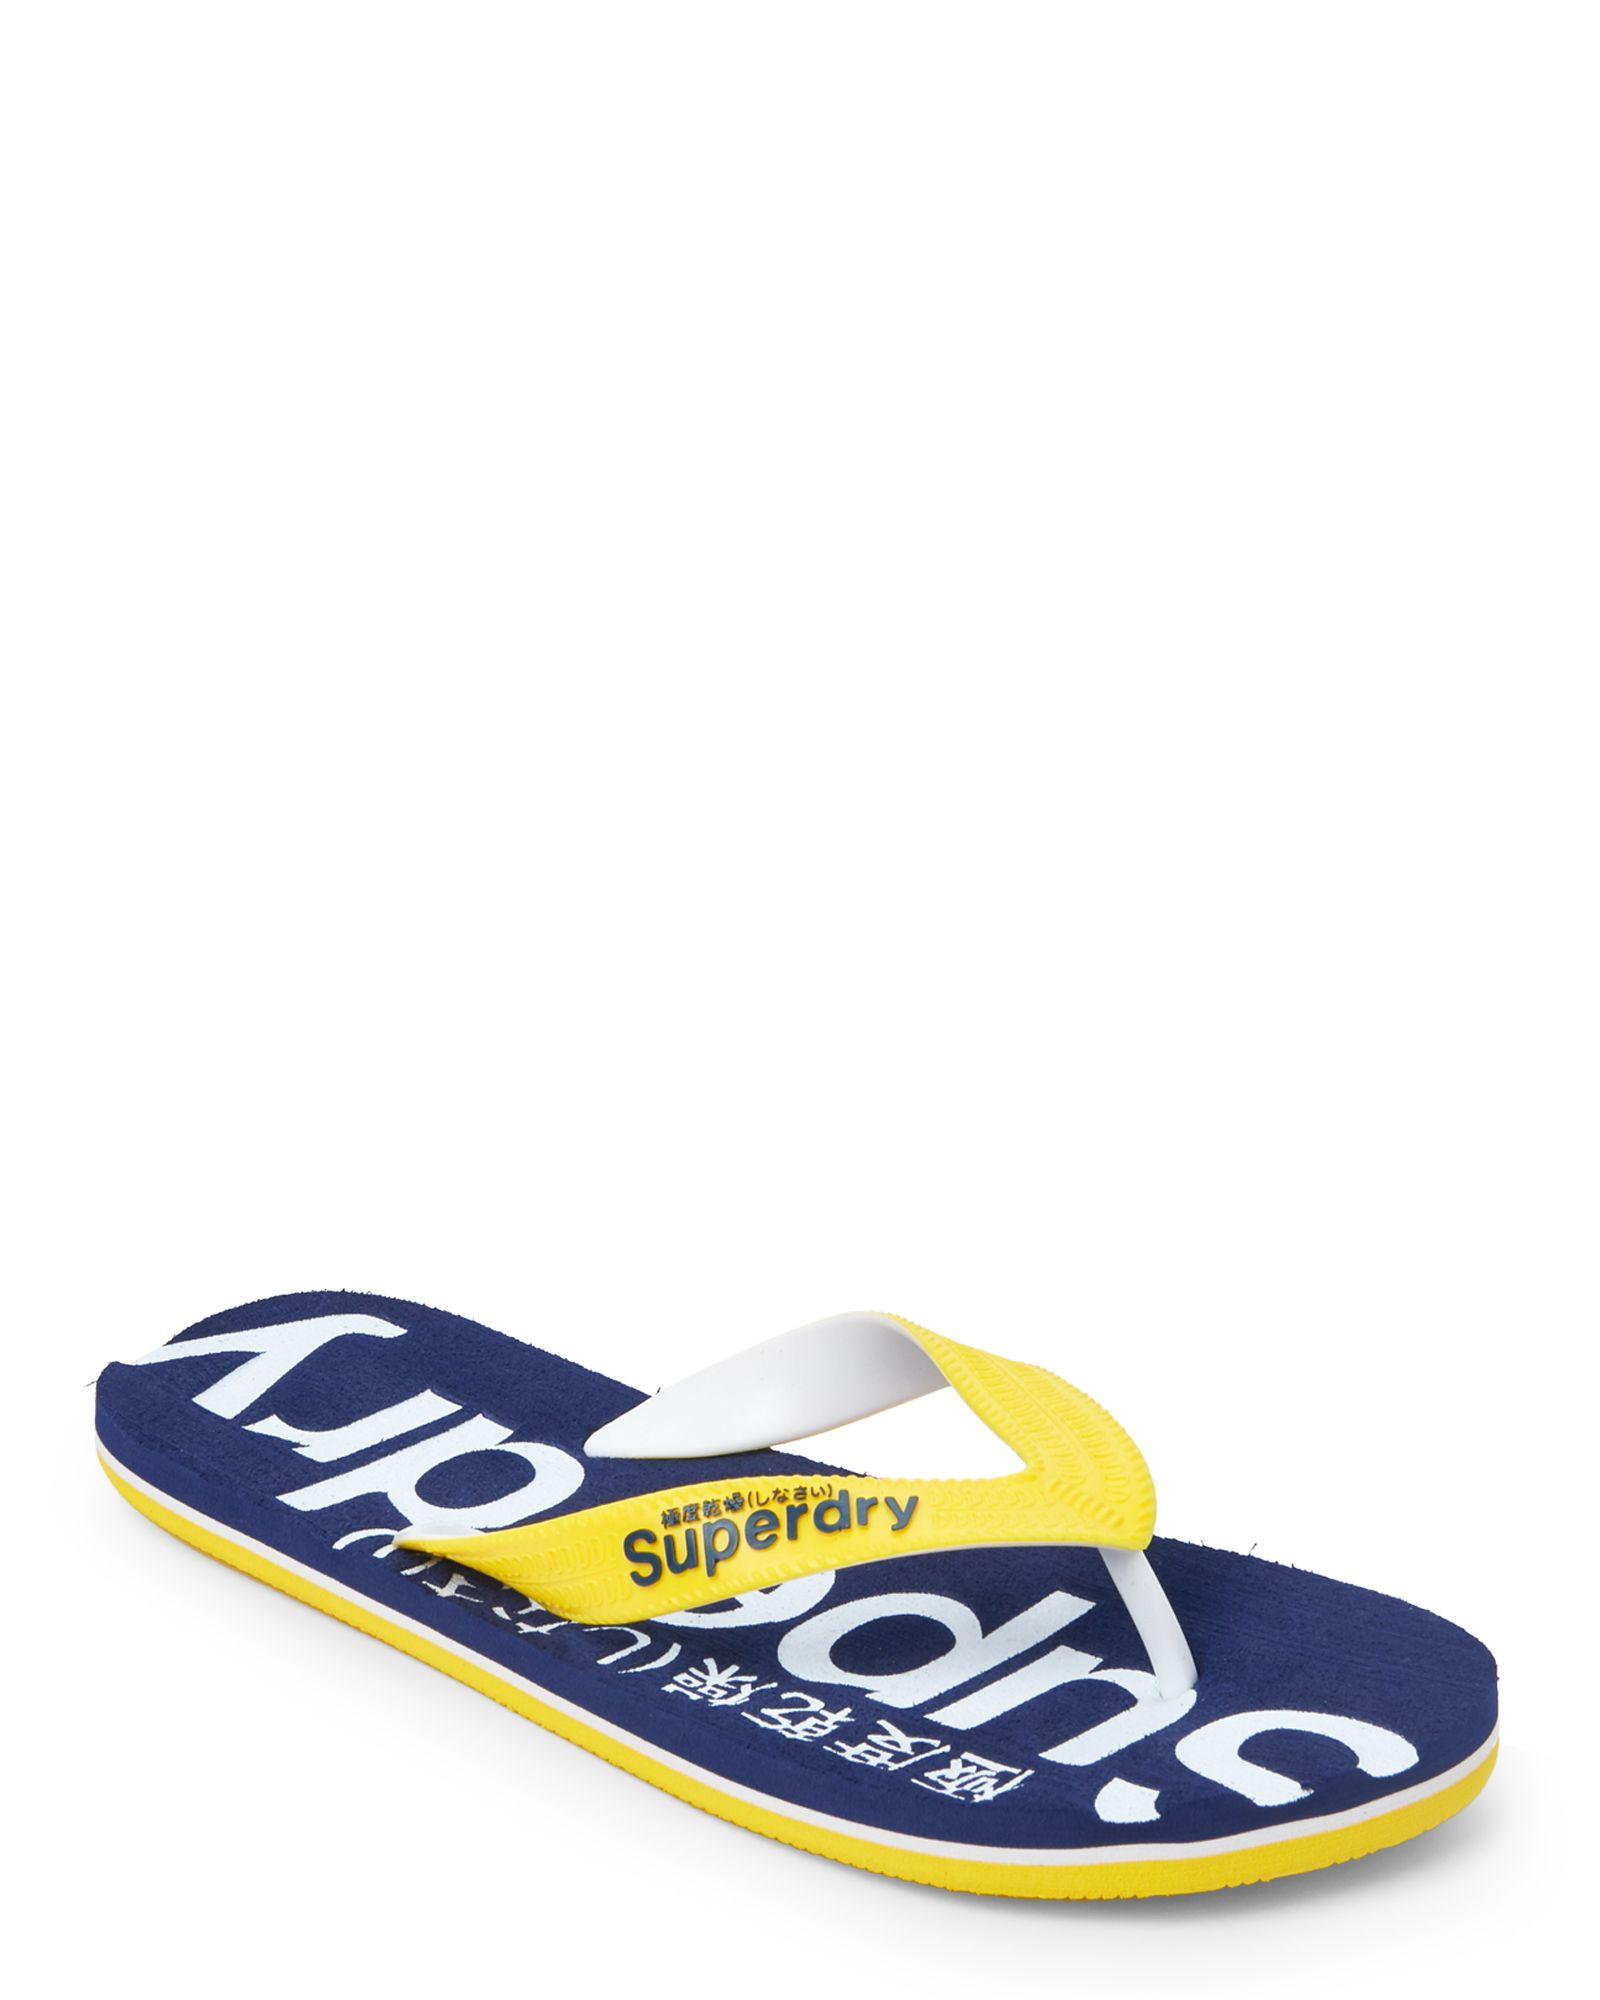 Superdry Navy & Yellow Logo Flip Flops